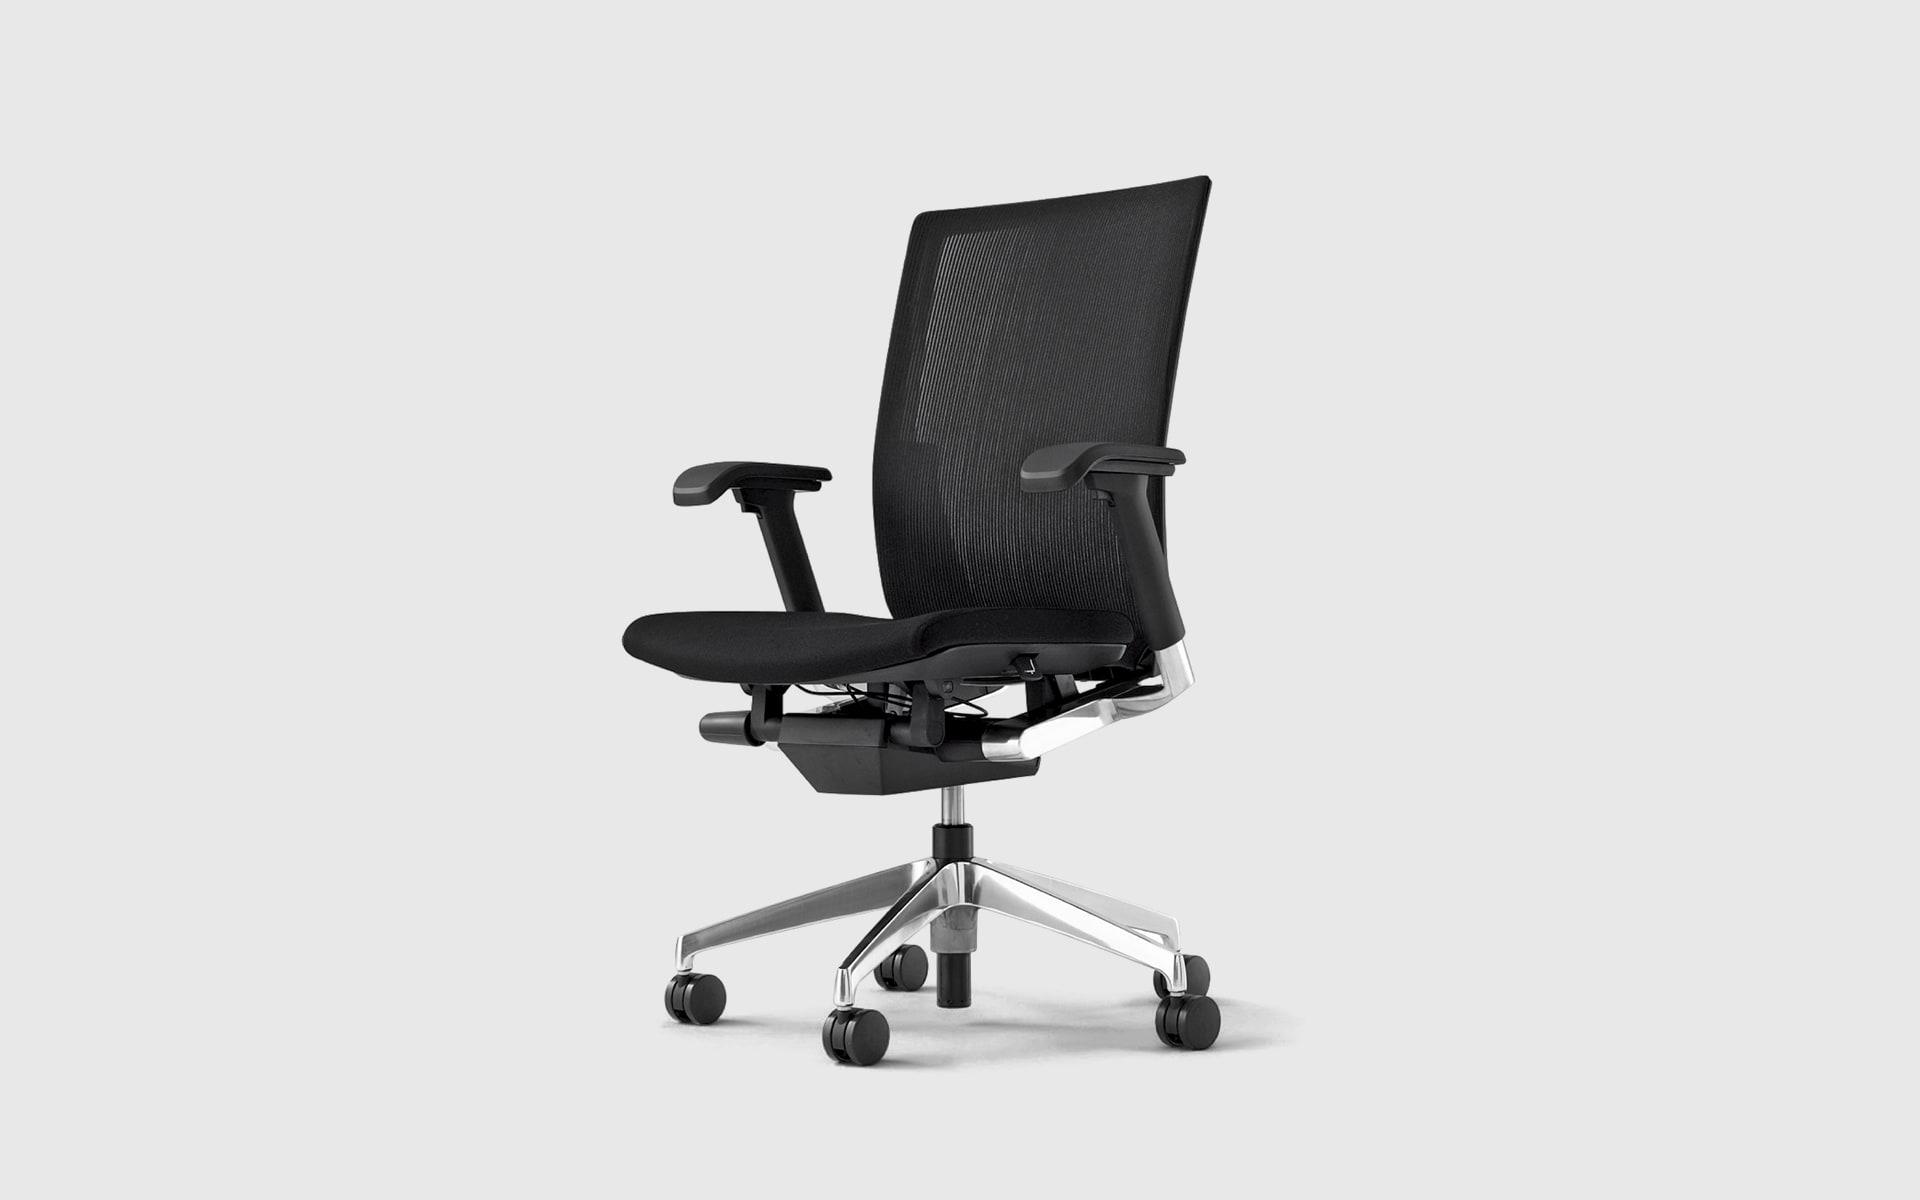 ITOKI Vento Bürostuhl von ITO Design in Schwarz